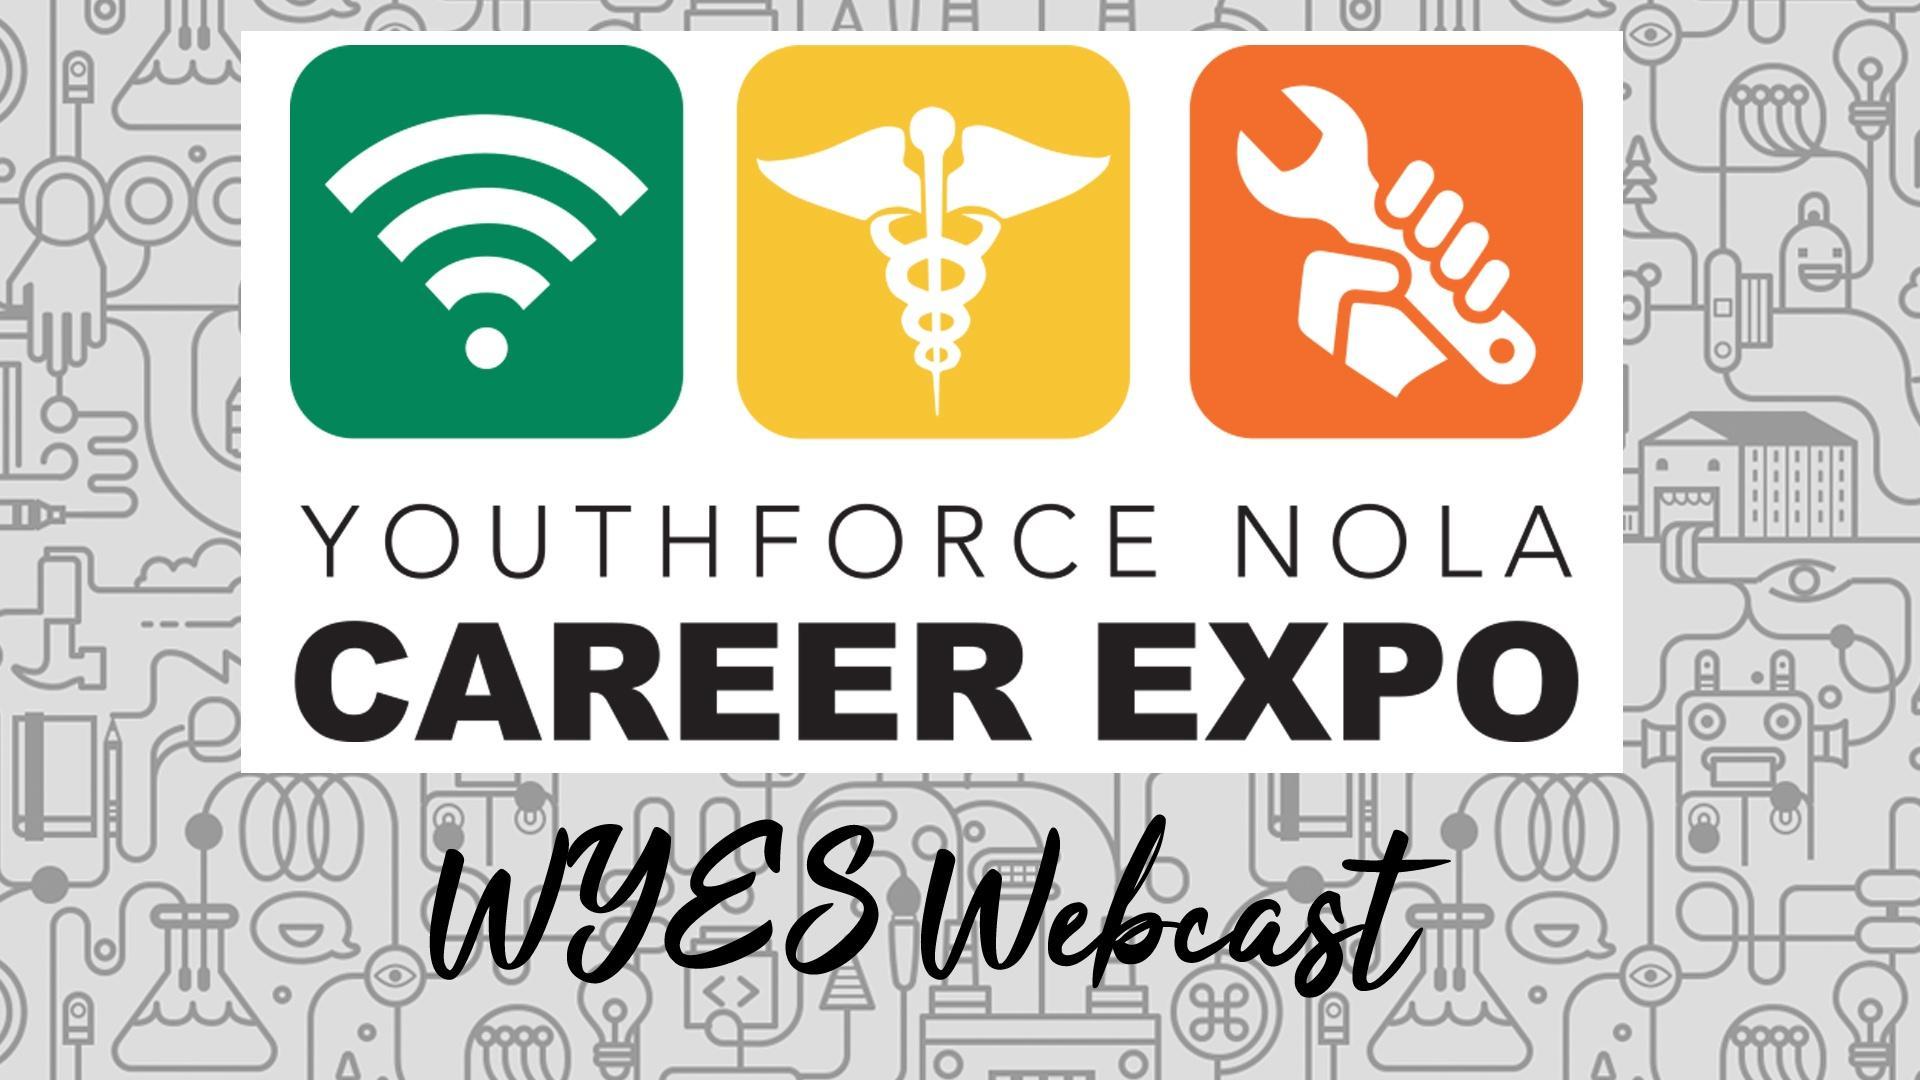 WYES YOUTHFORCE NOLA CAREER EXPO WEBCAST